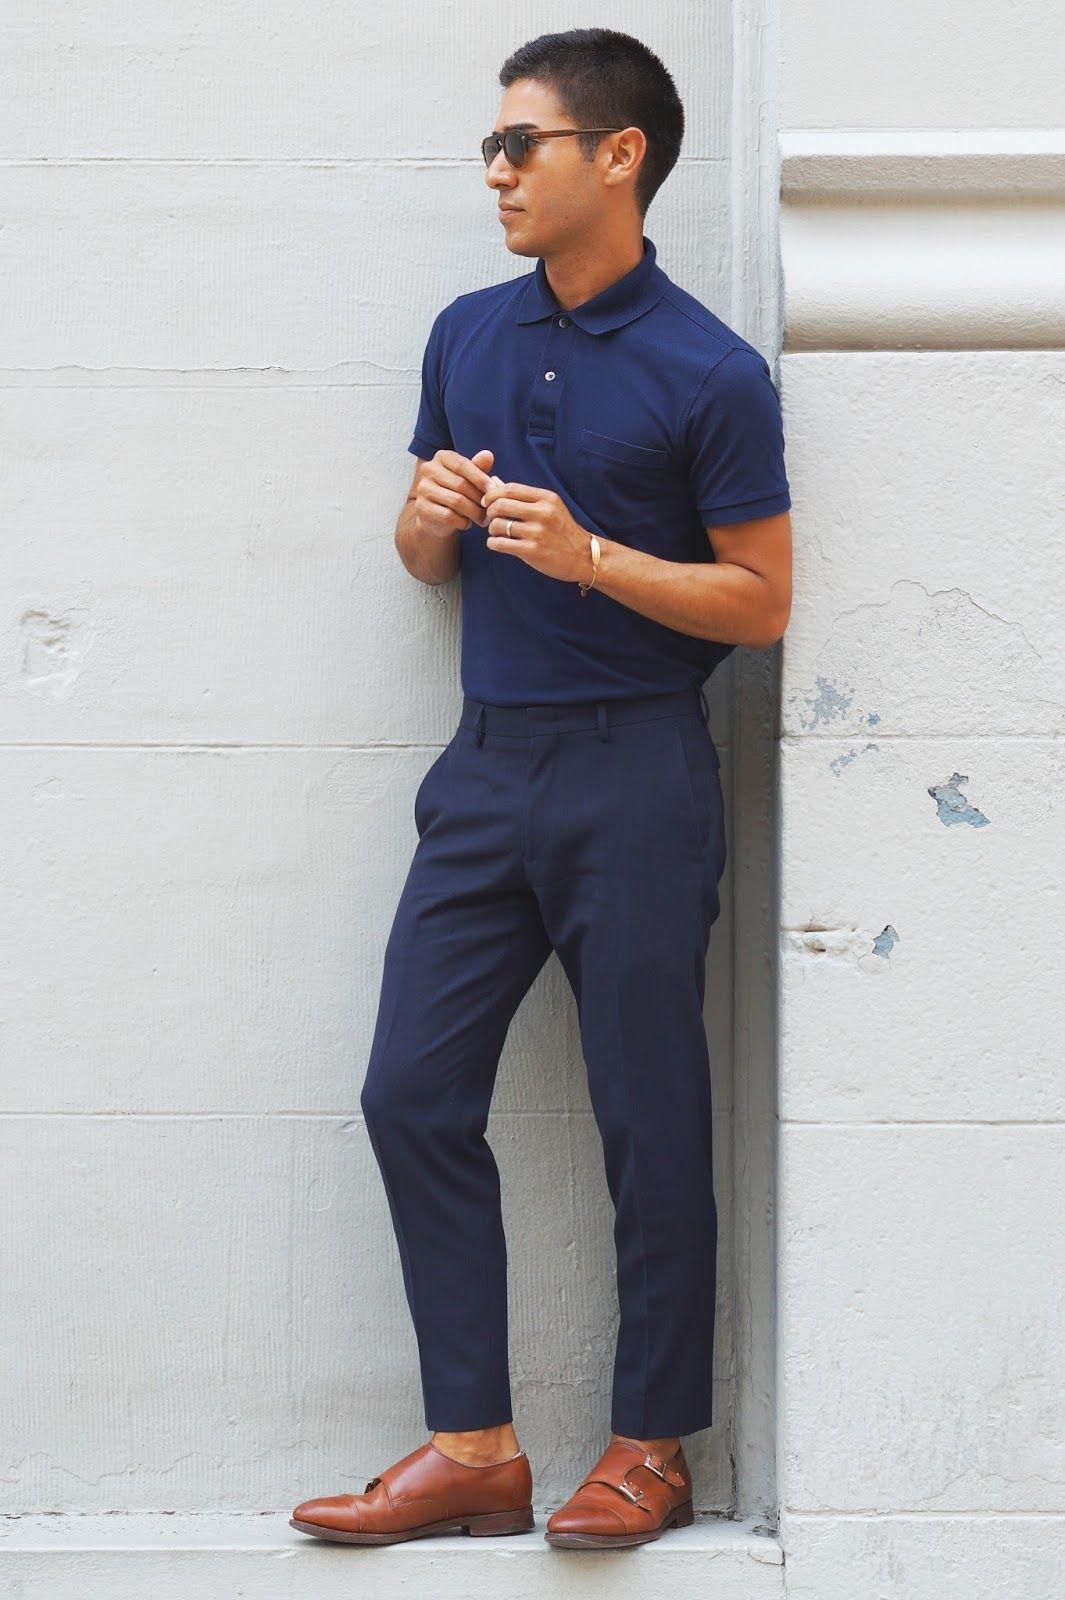 kết hợp áo polo nam với giày monk trap